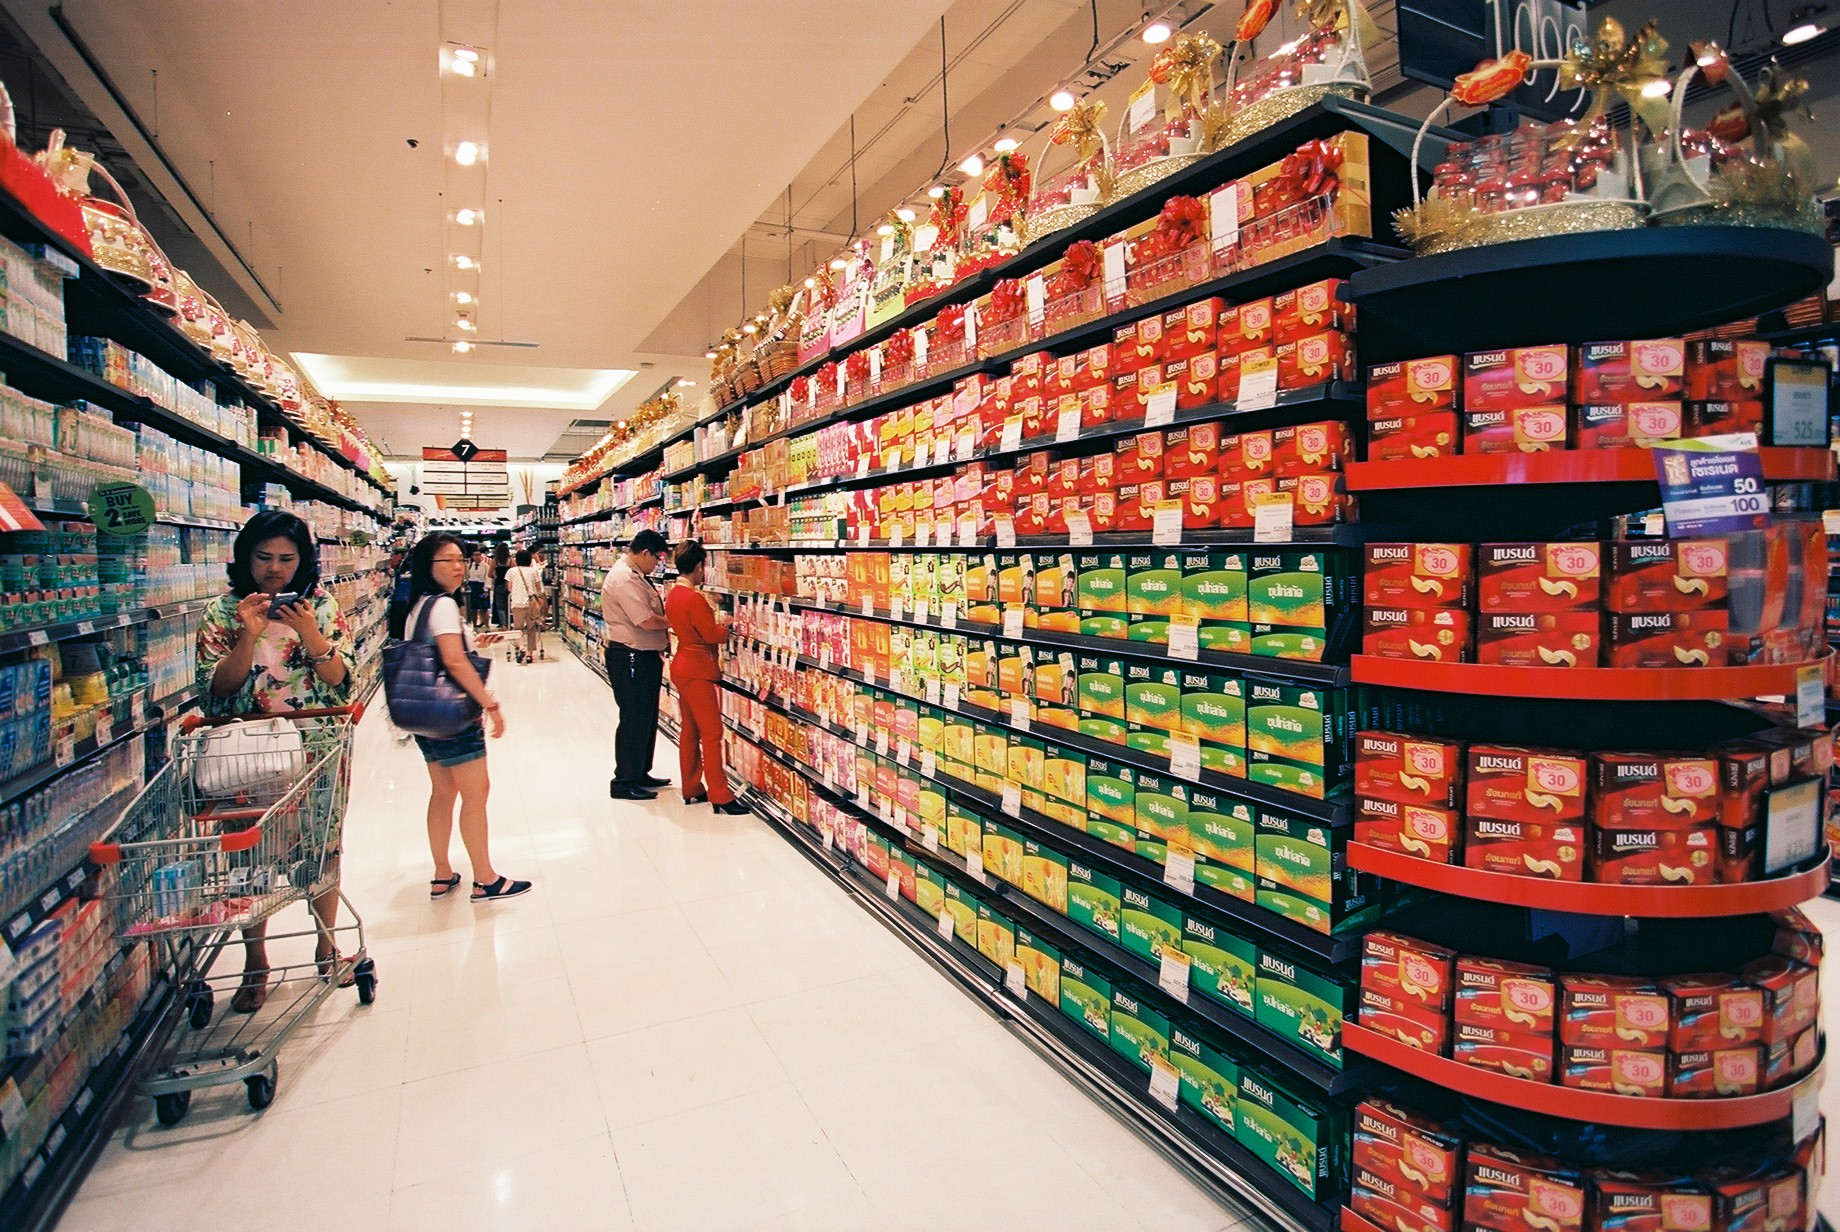 Ektar 100 | I love walking around supermarkets! Look at the colours...